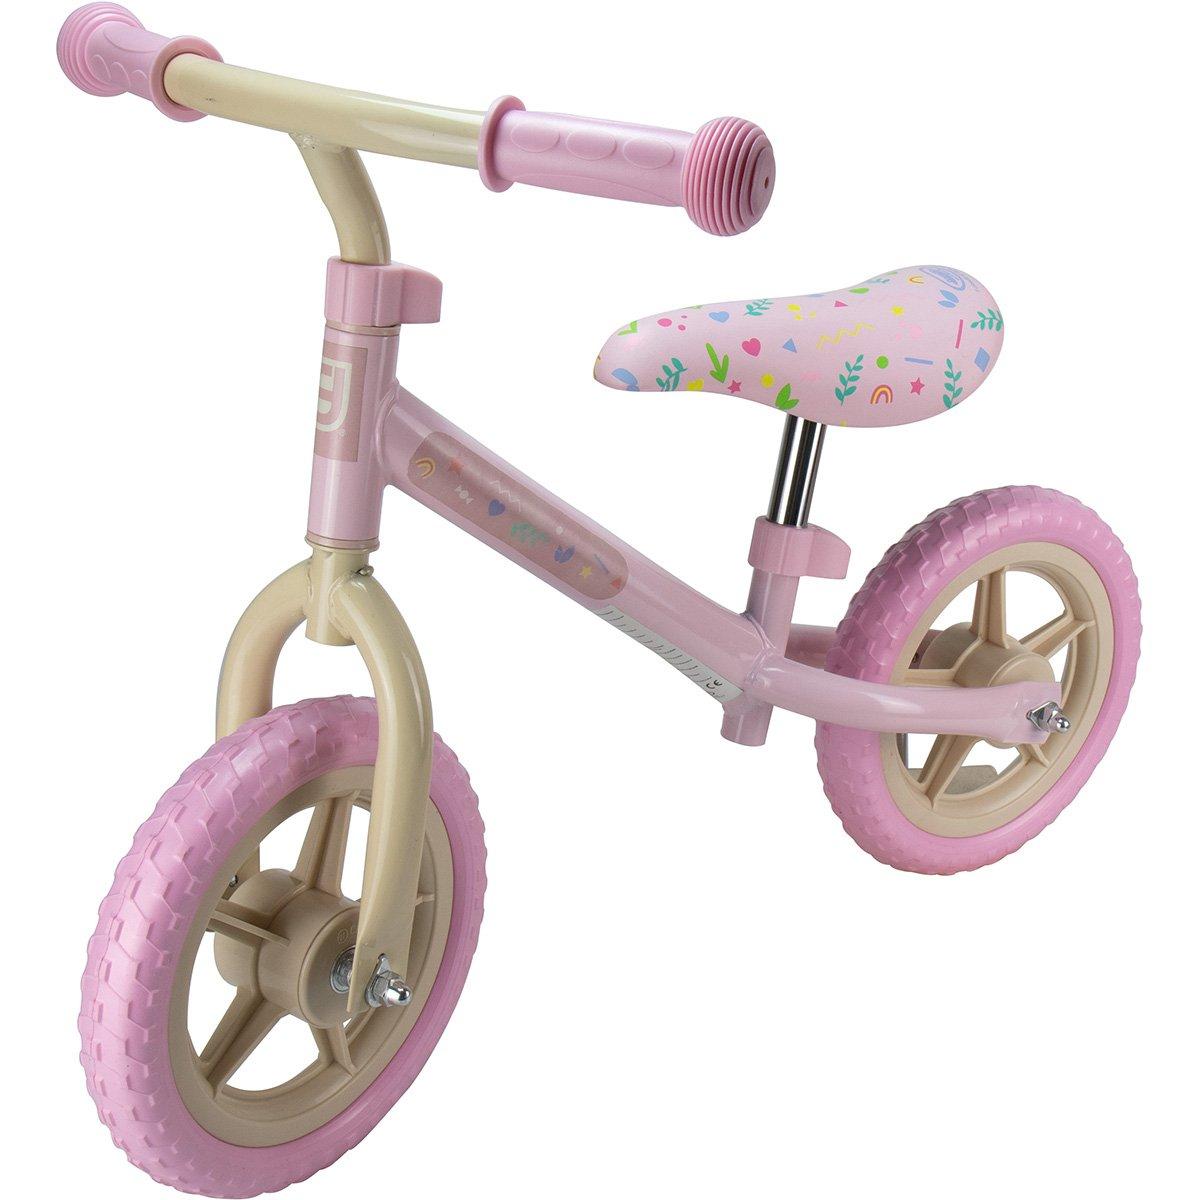 Bicicleta fara pedale Funbee, Roz imagine